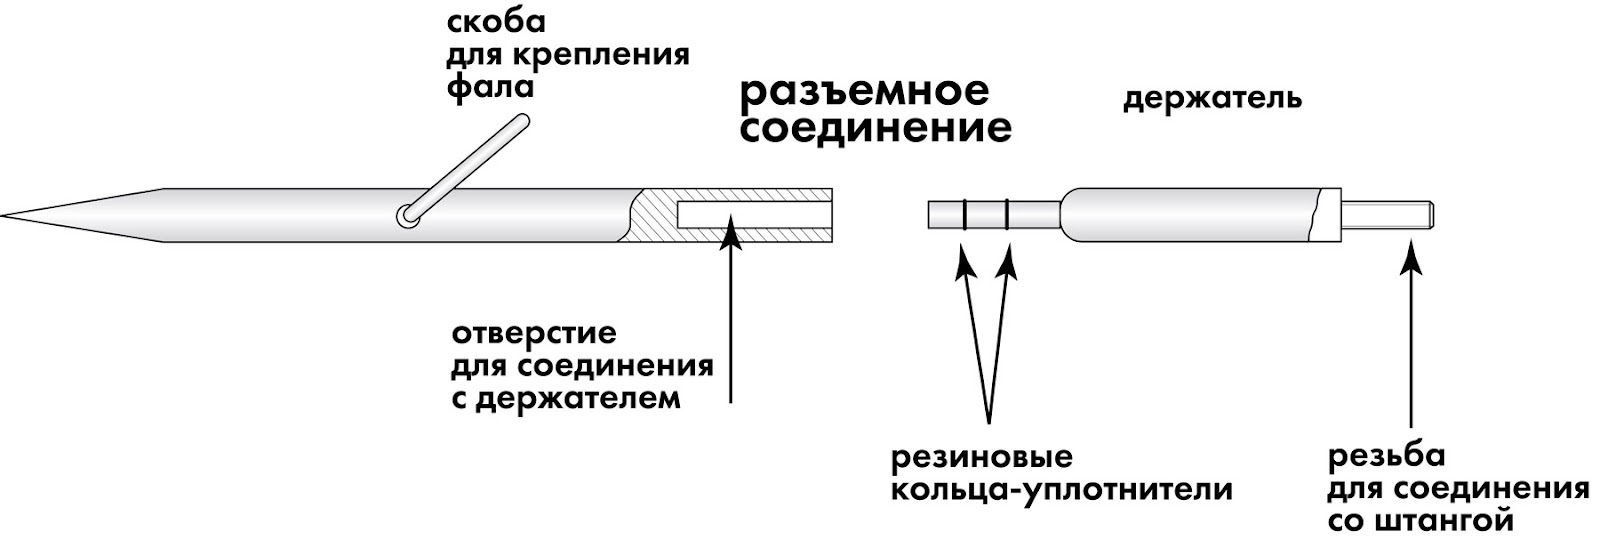 Схема сборки сушки для посуды фото 232